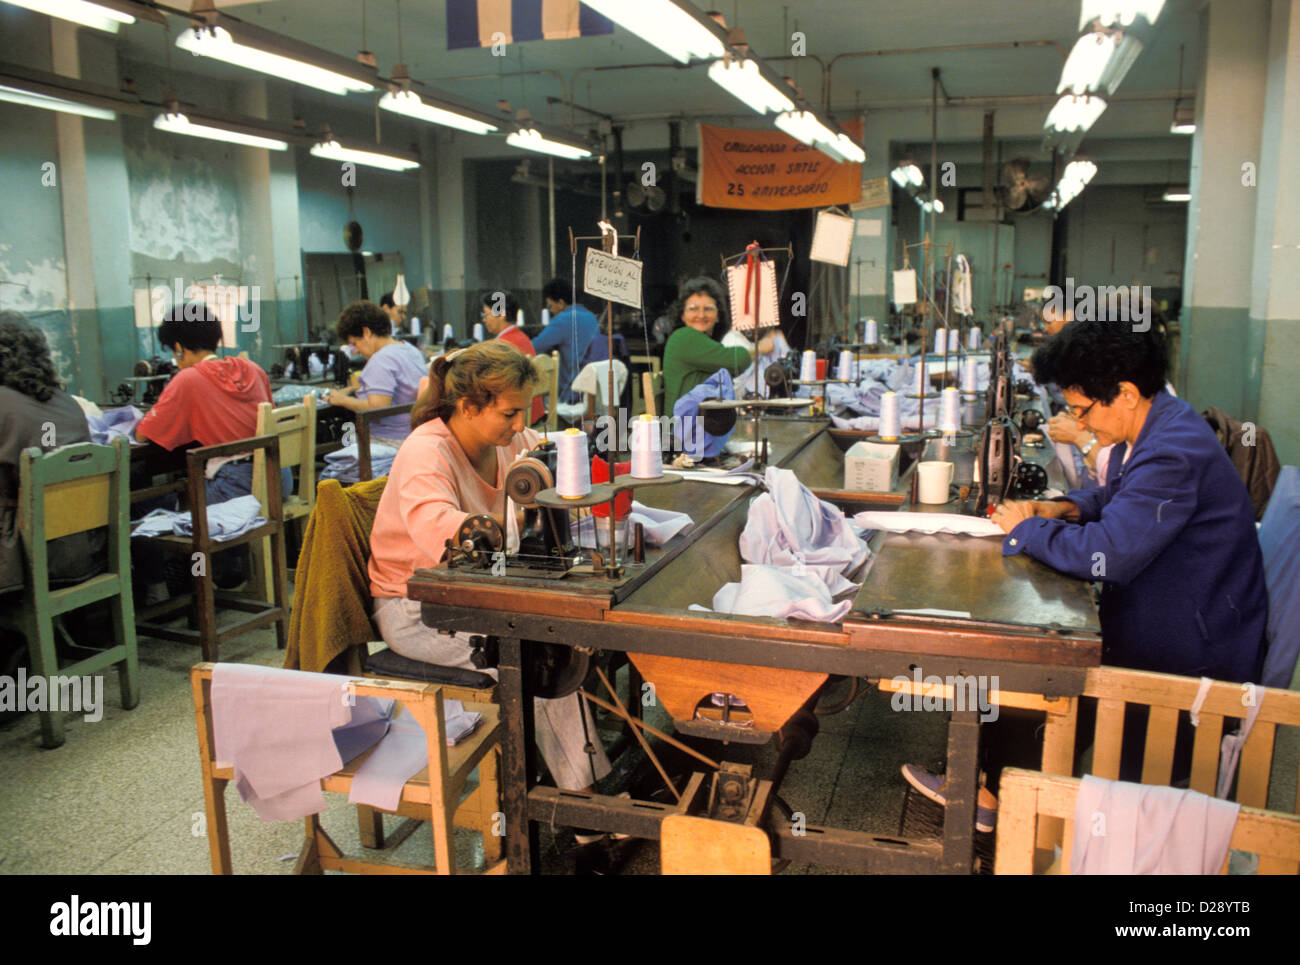 Cuba. Havana. Women Sewing Uniforms. - Stock Image